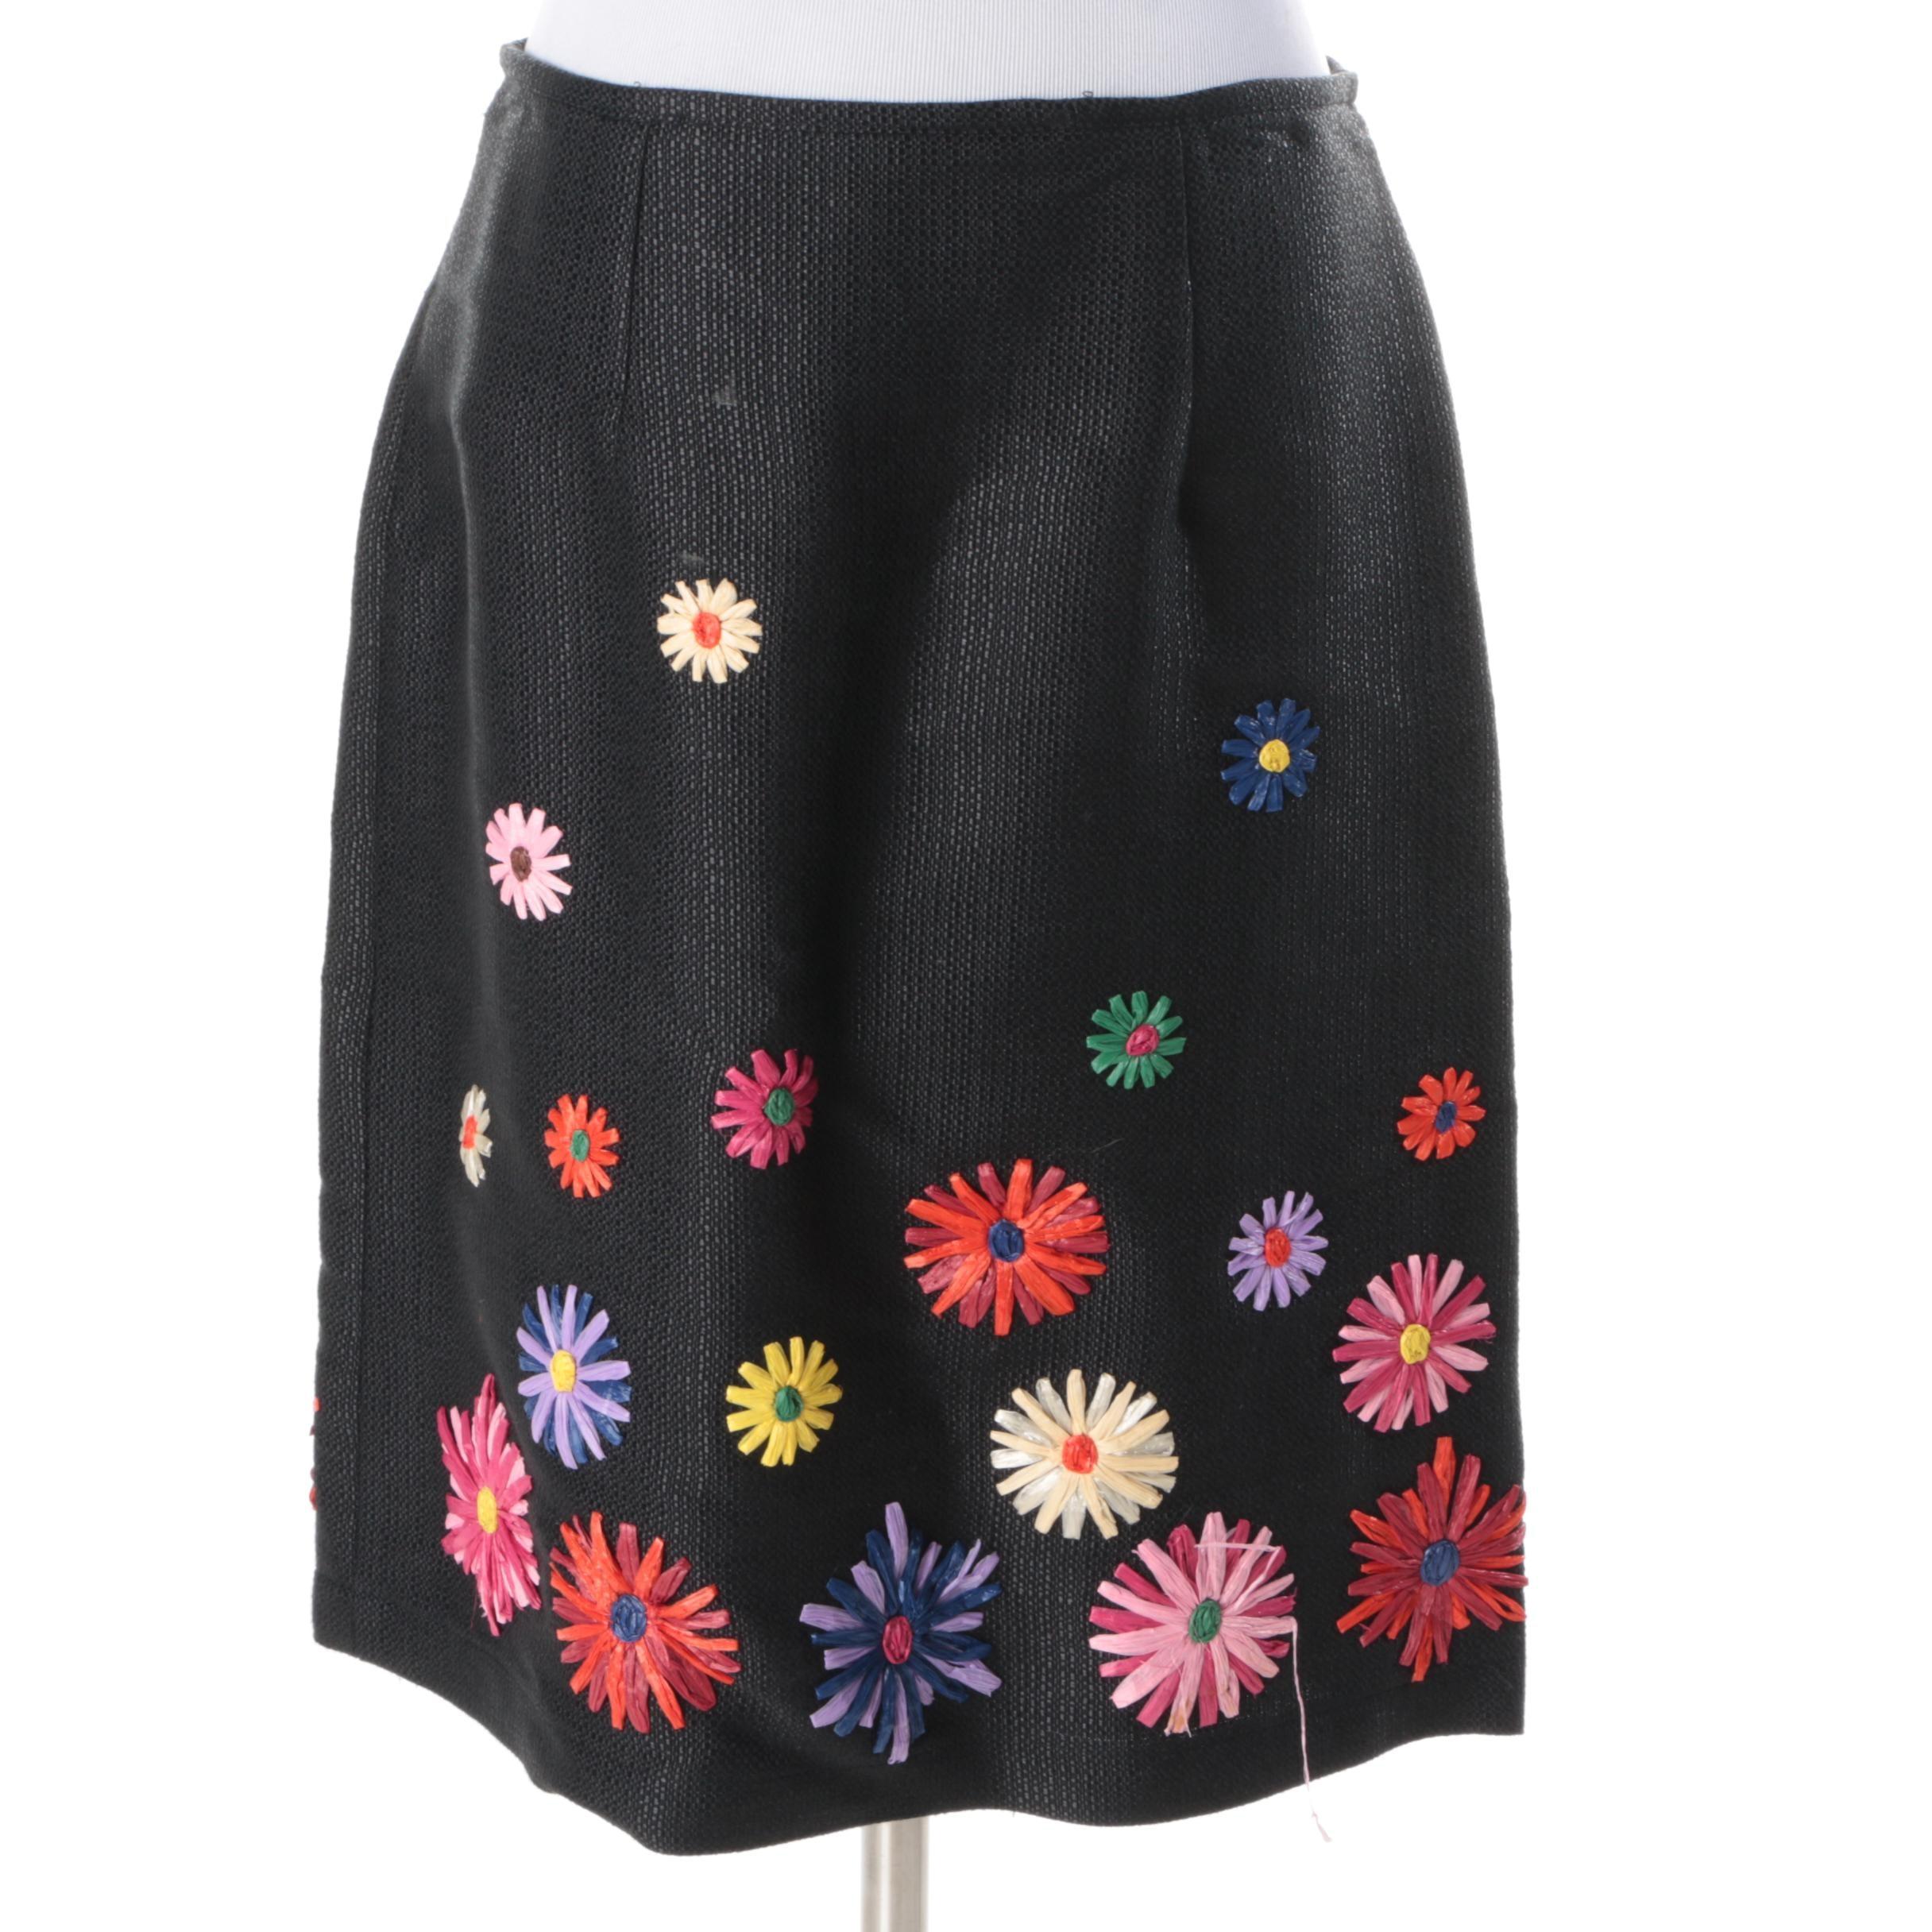 Moschino Jeans Skirt